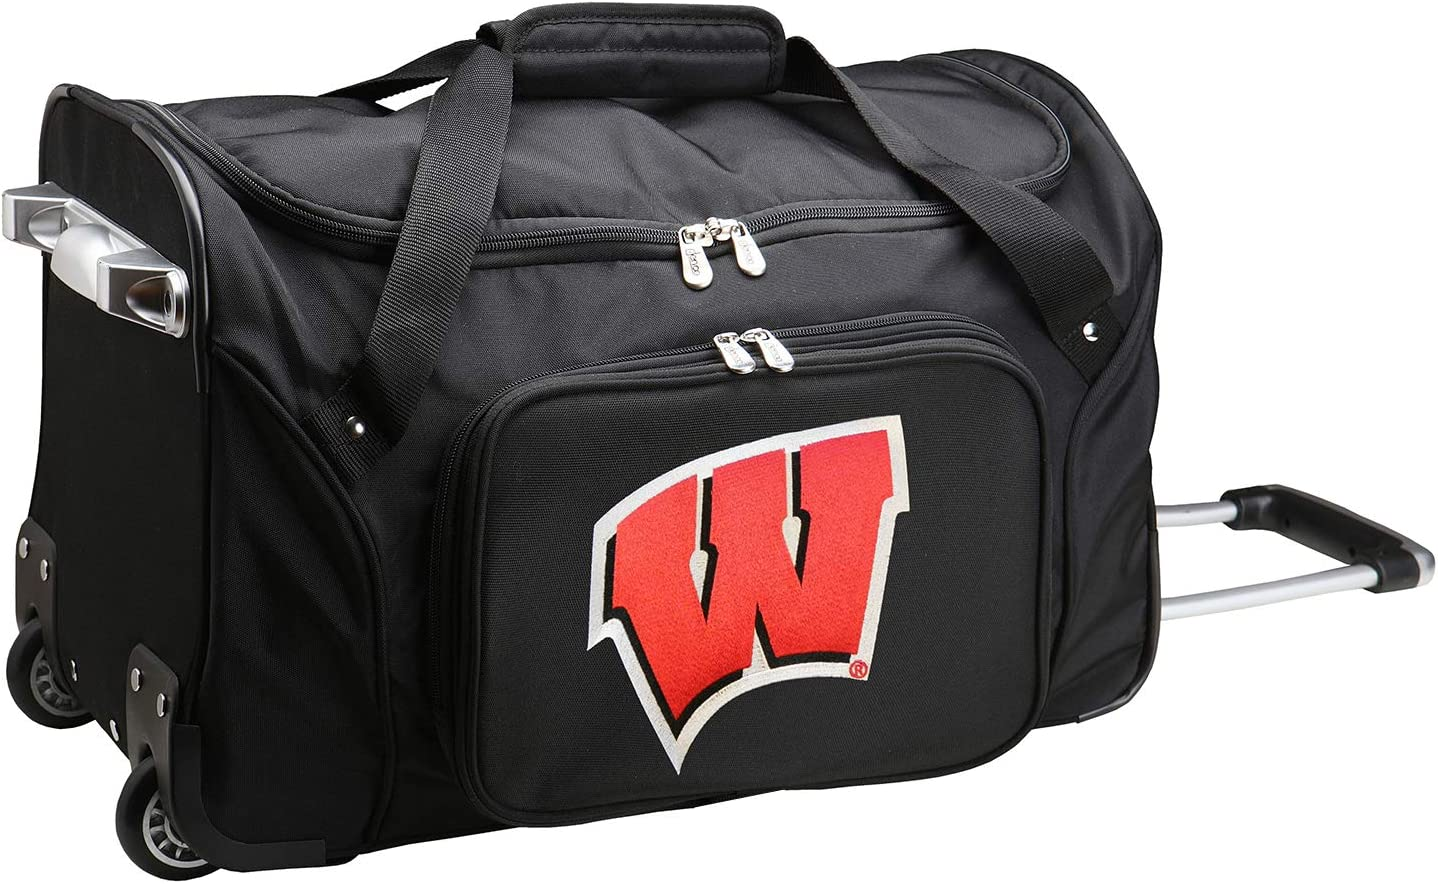 22-inches NCAA Wheeled Duffel Bag